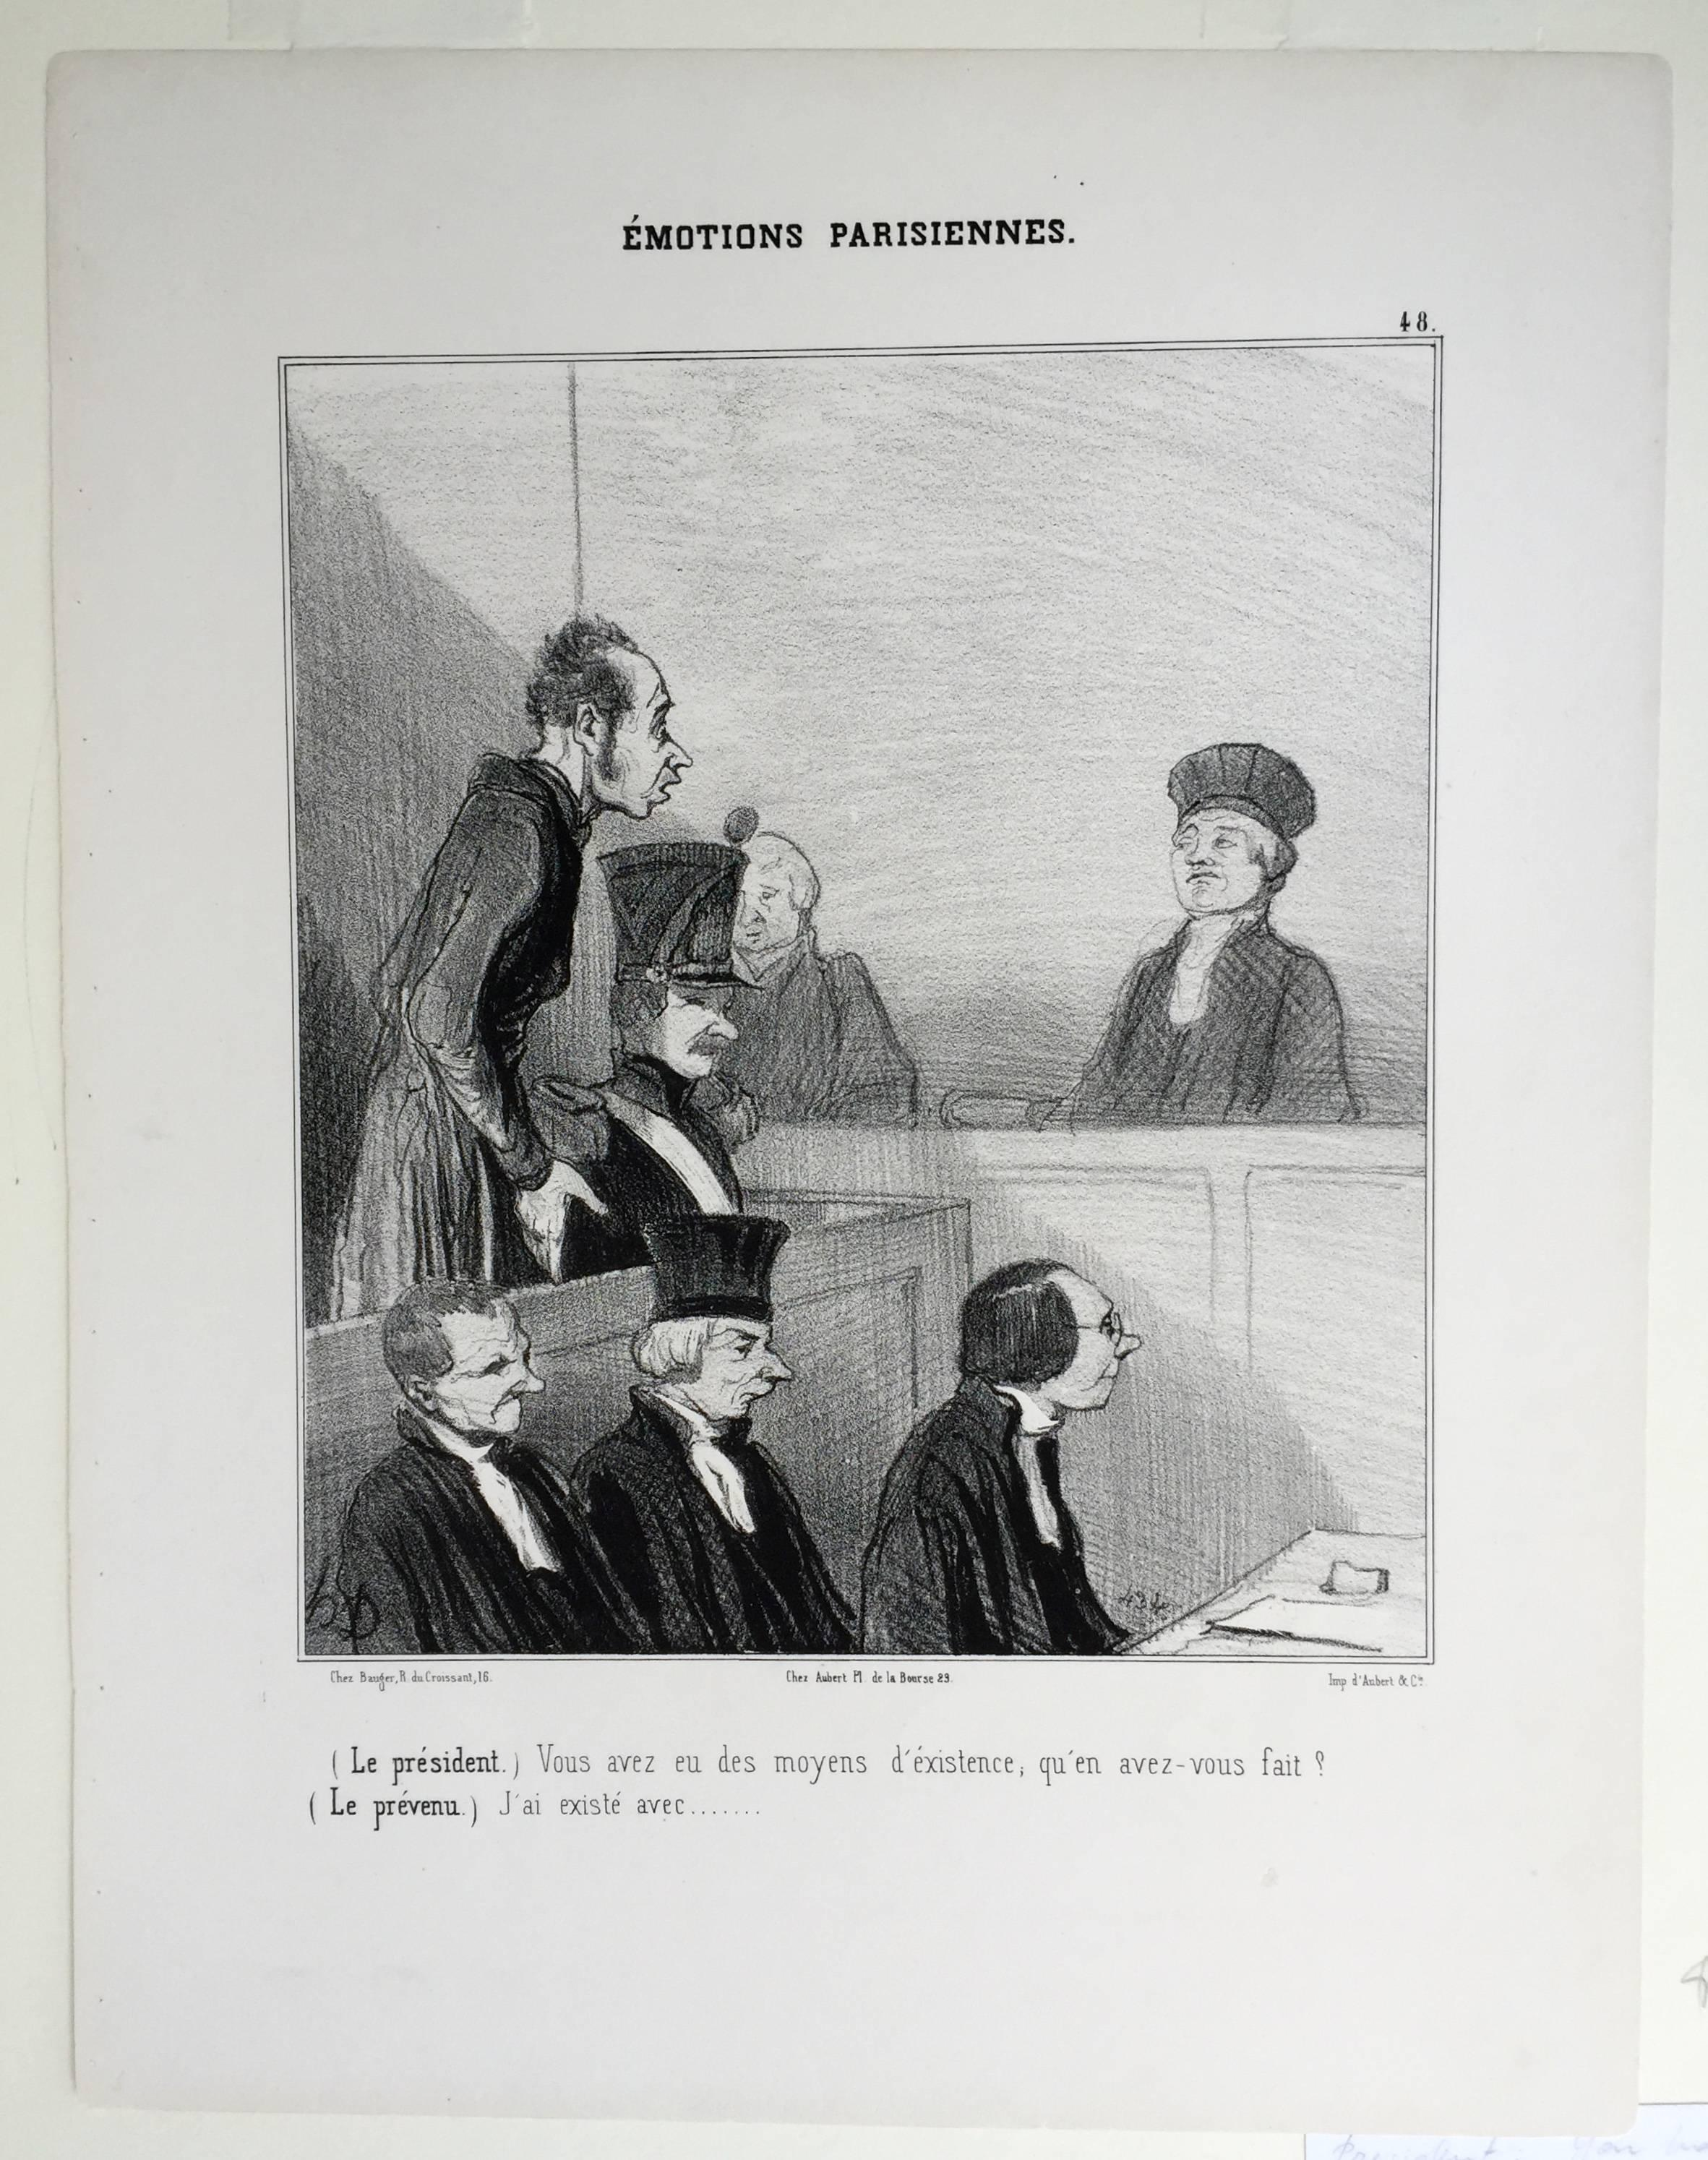 Emotions Parisiennes